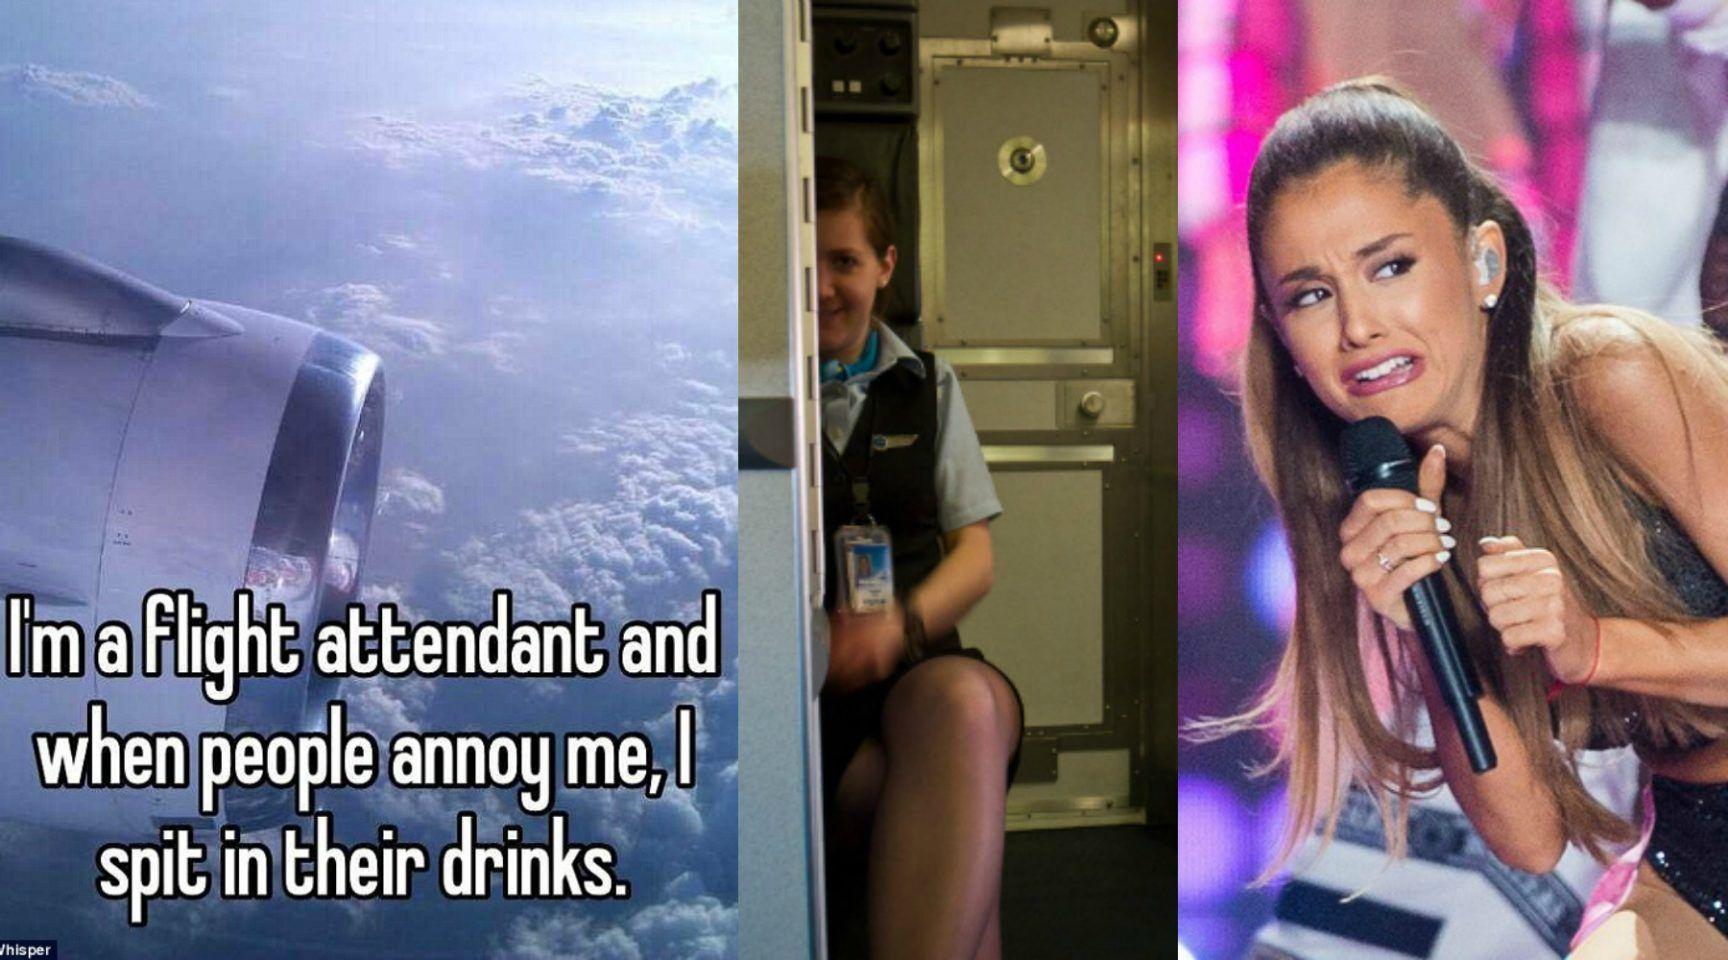 15 Utterly Cringeworthy Whisper Confessions From Flight Attendants